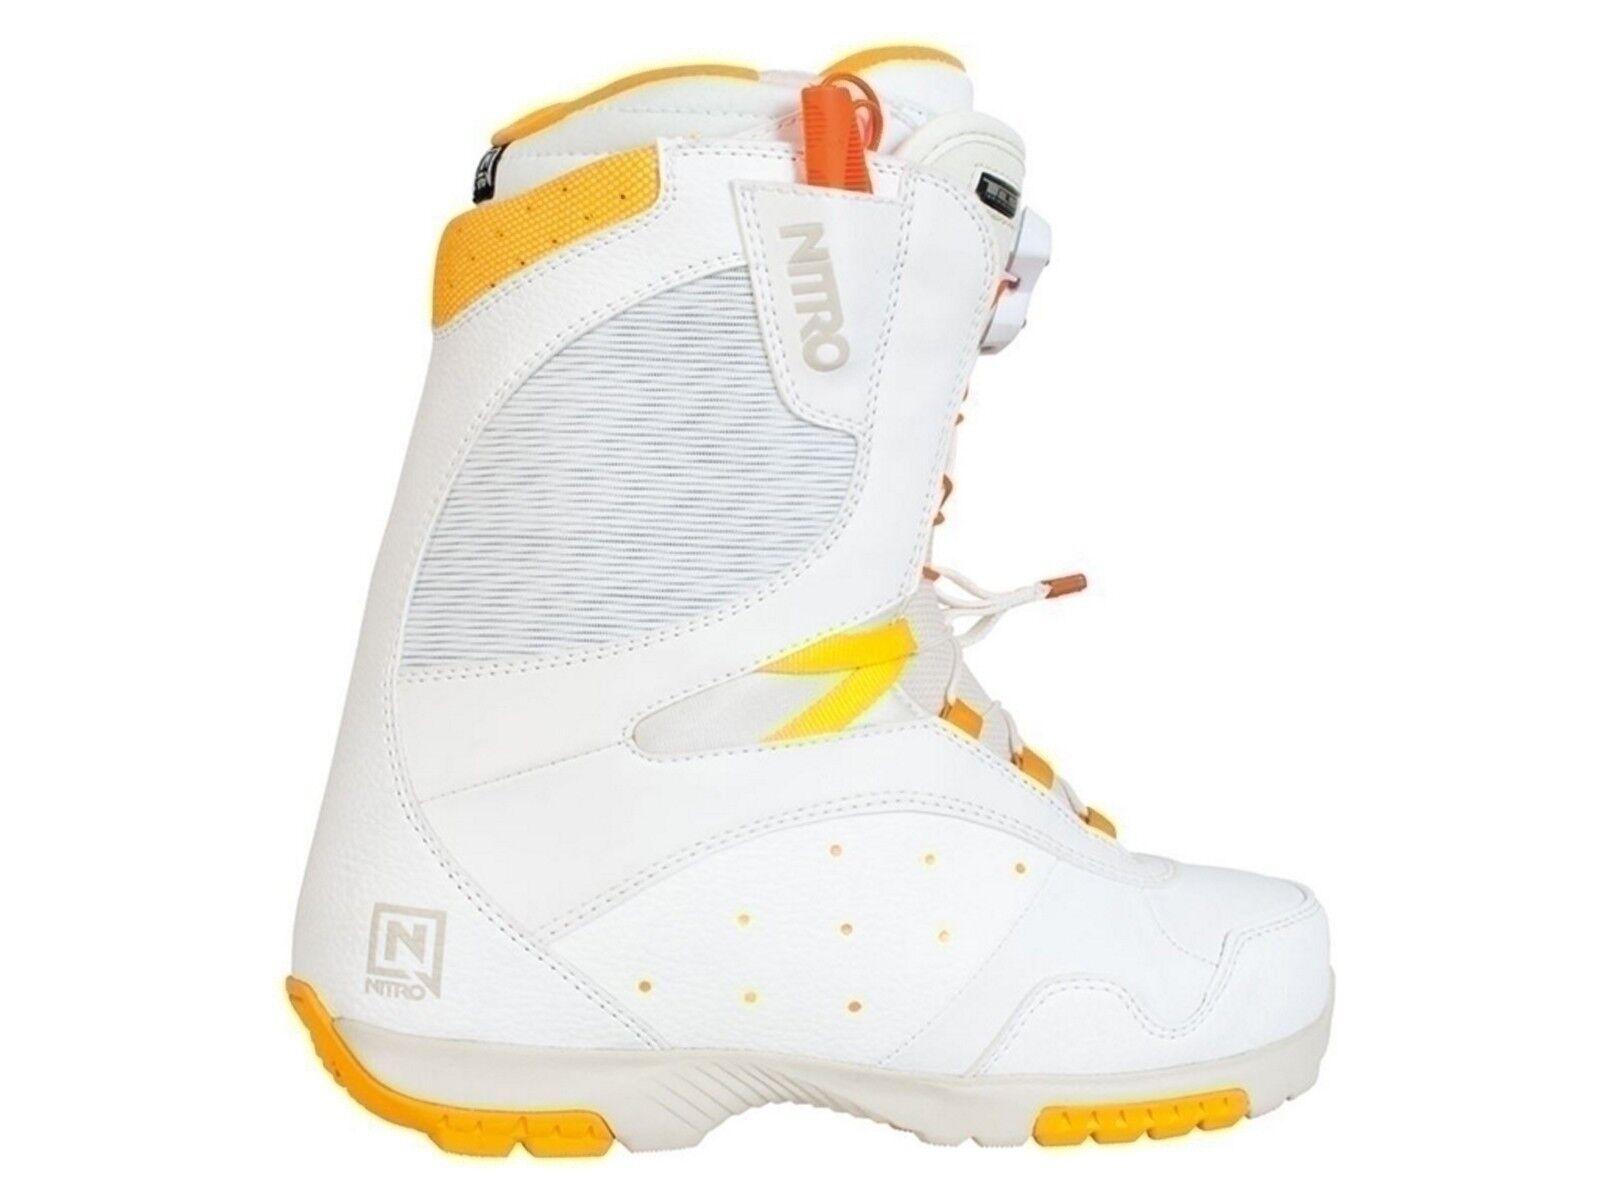 SCARPONI SNOWBOARD DONNA NITRO  848283 002  CROWN TLS bianca arancia giallo